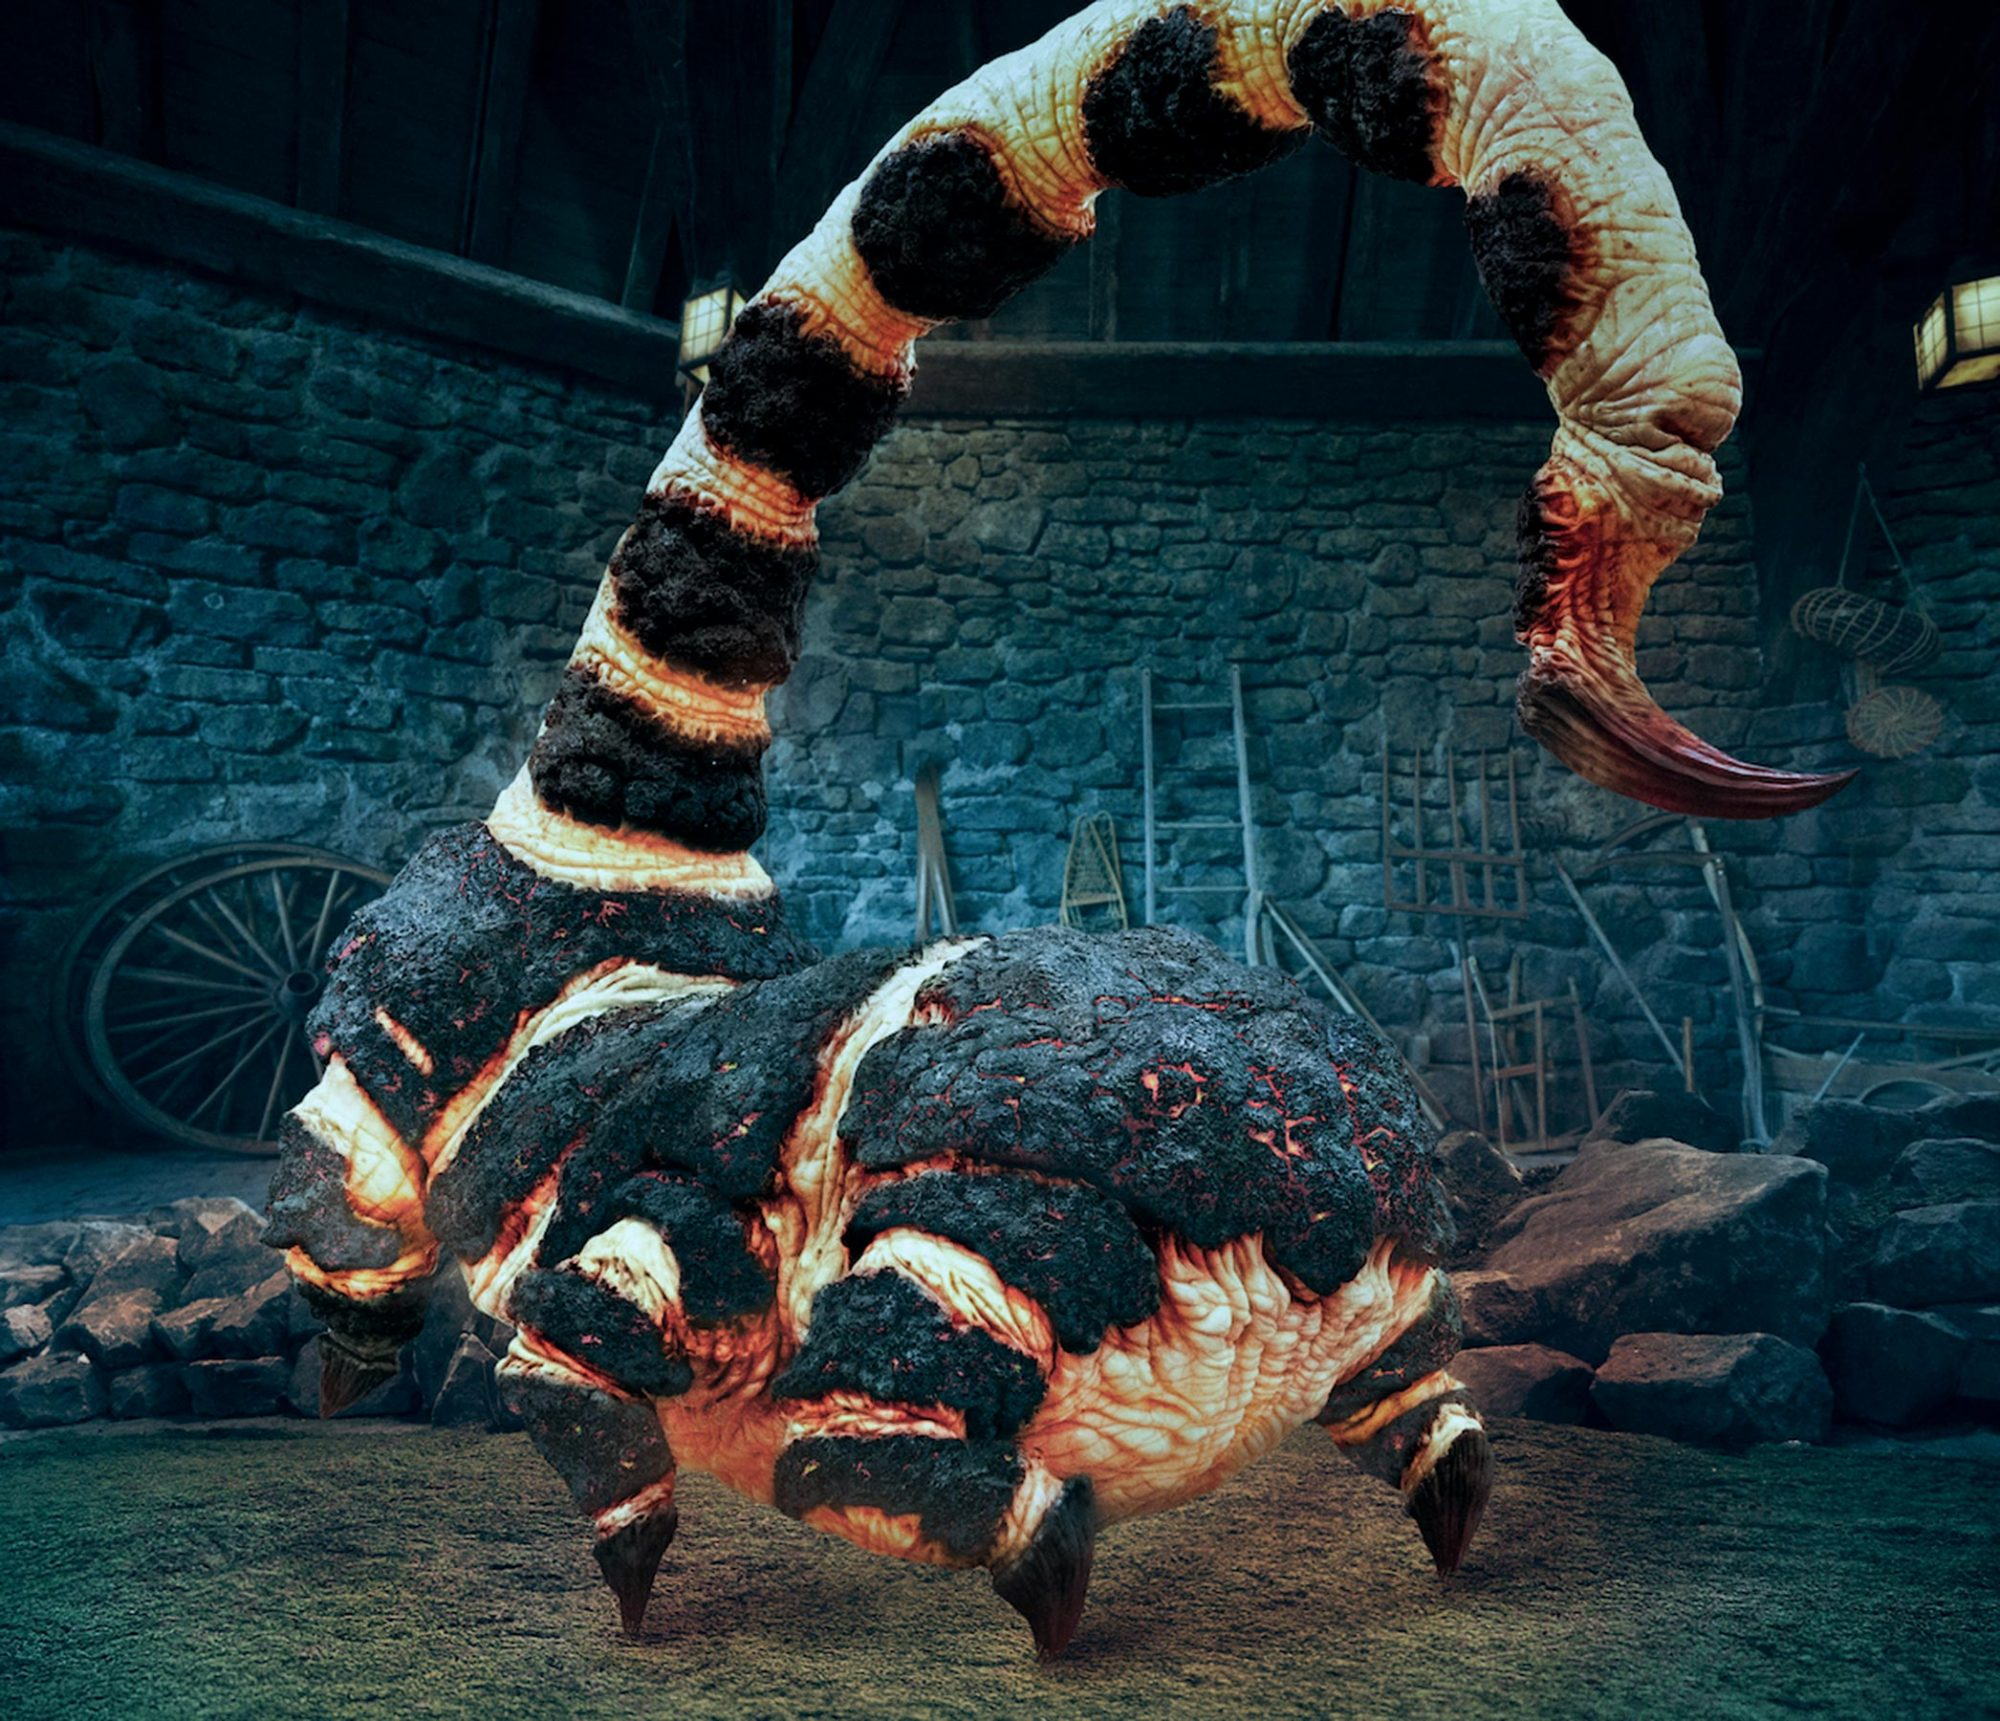 Blast-Ended Skrewt at Hagrid's Magical Creatures Motorbike Adventure CR: Universal Orlando